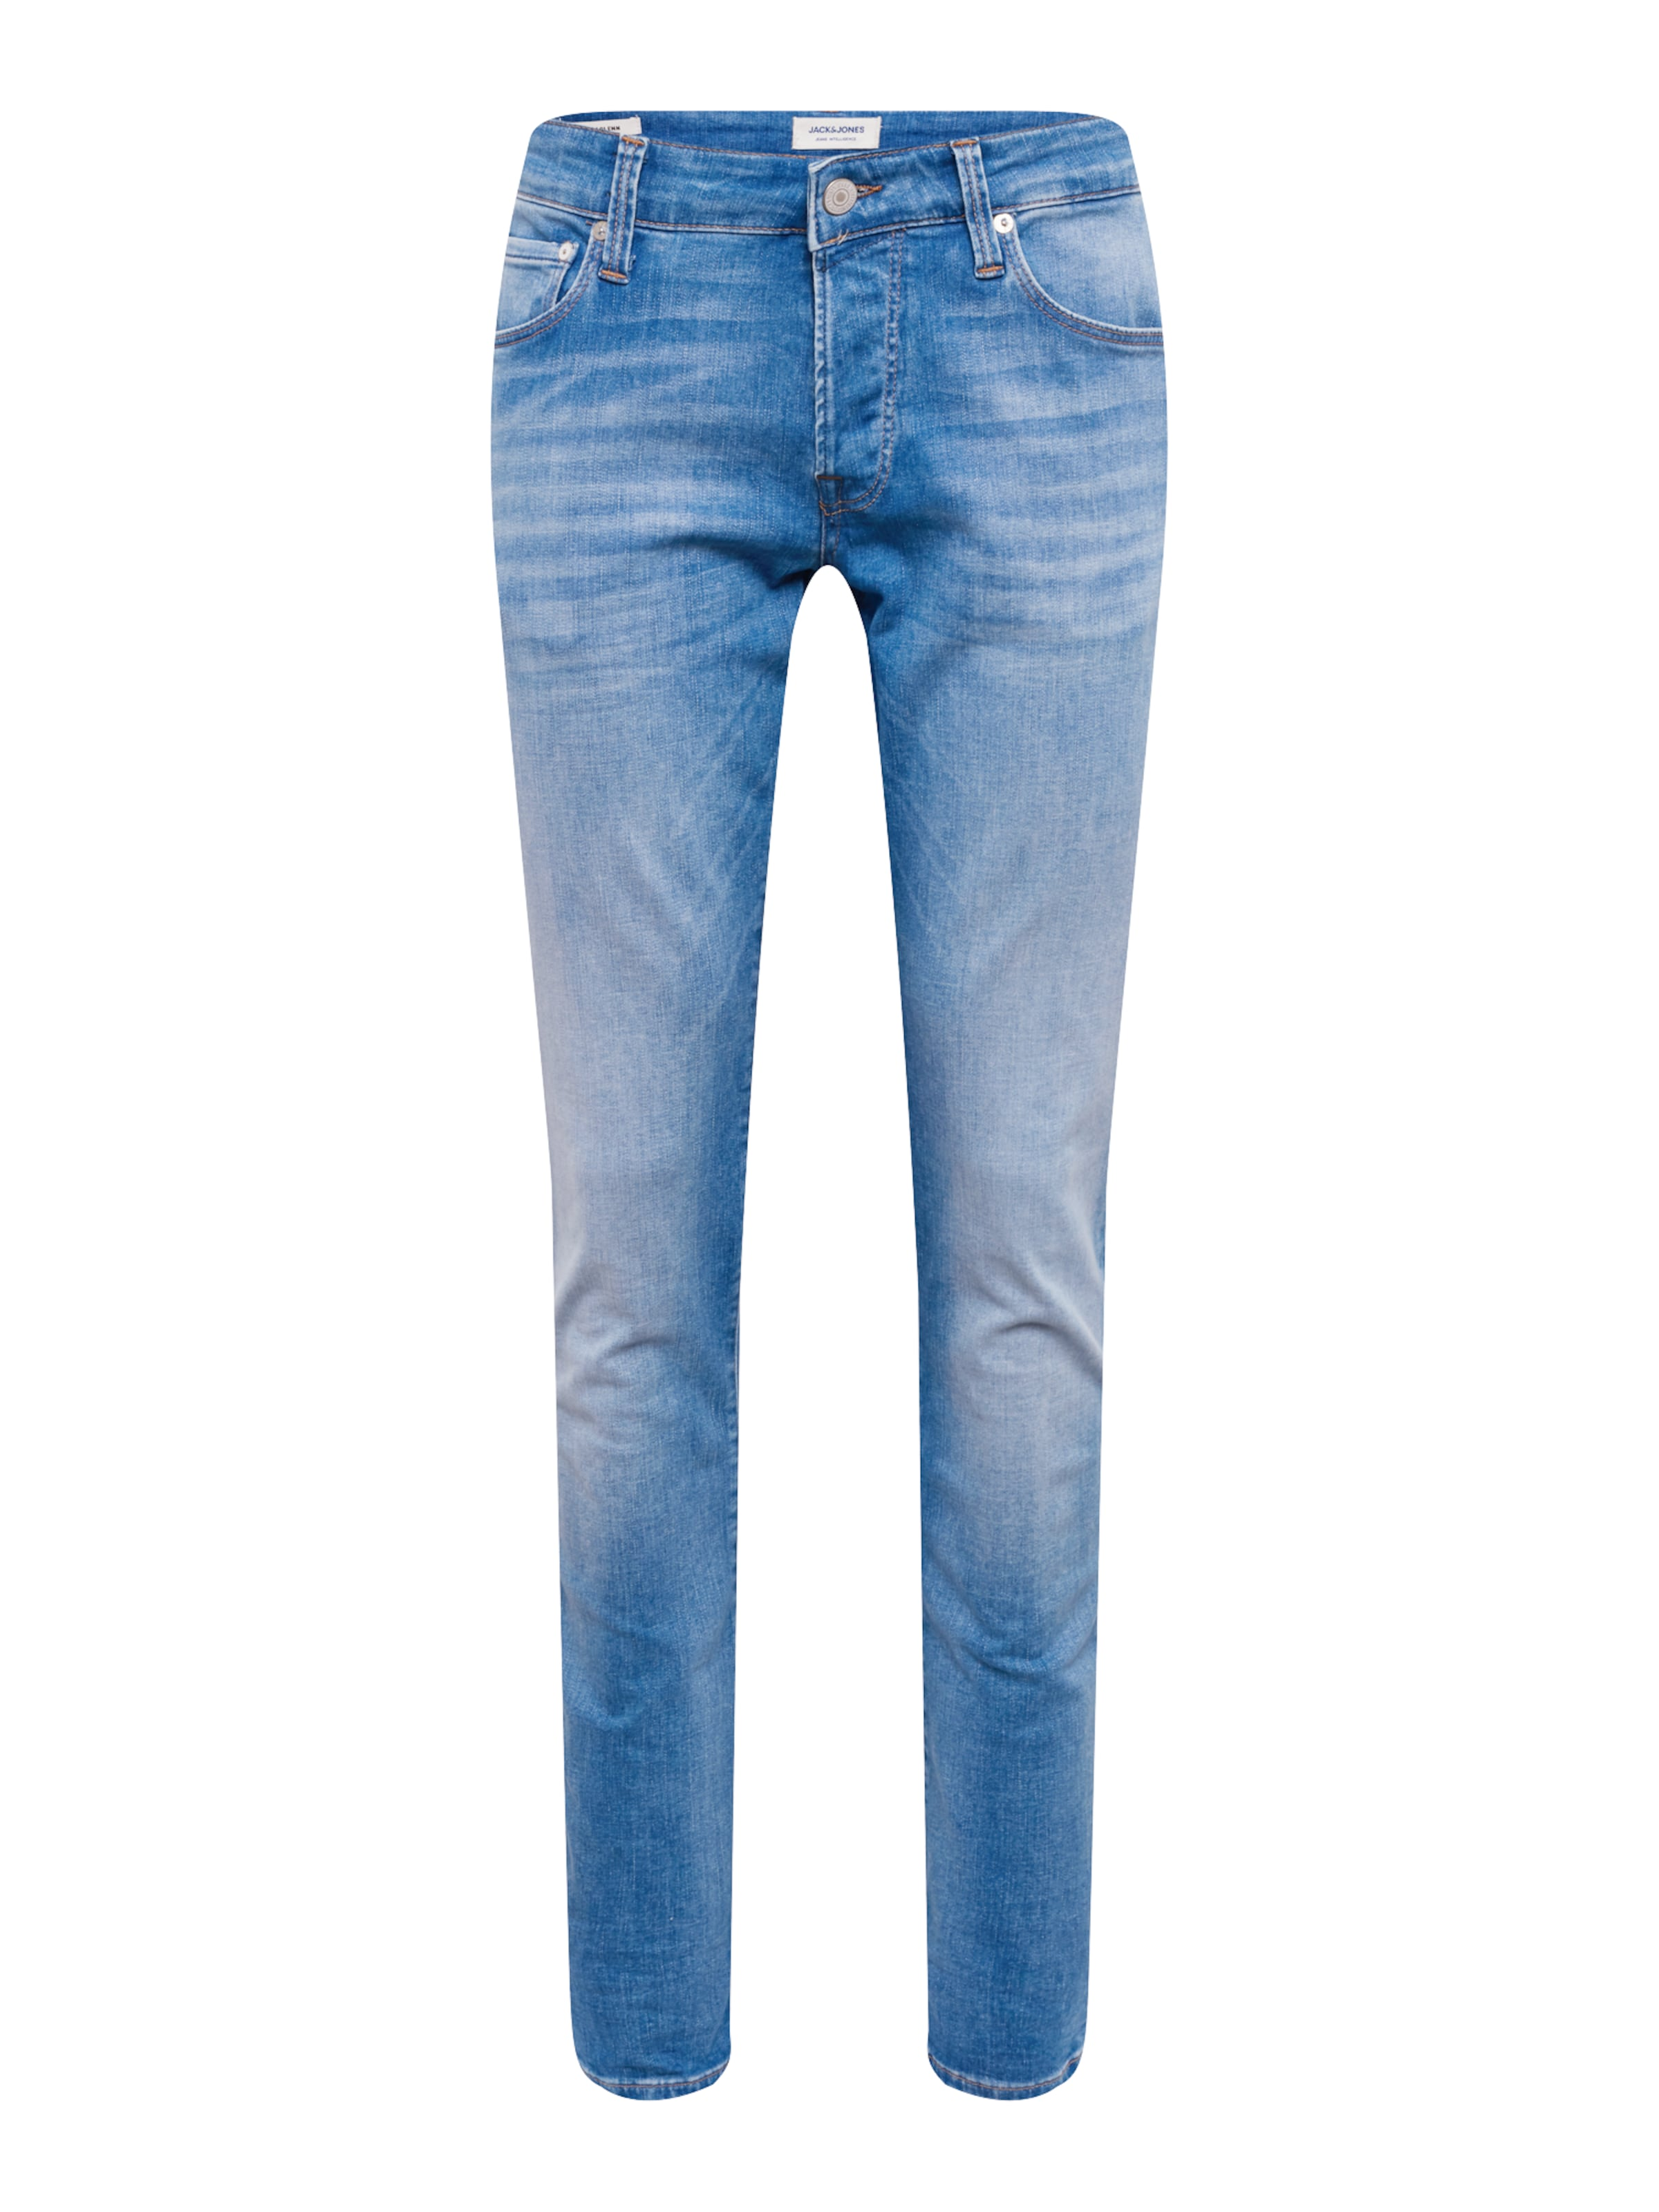 In Jeans Blue Jackamp; Denim 'glenn' Jones xerodCB